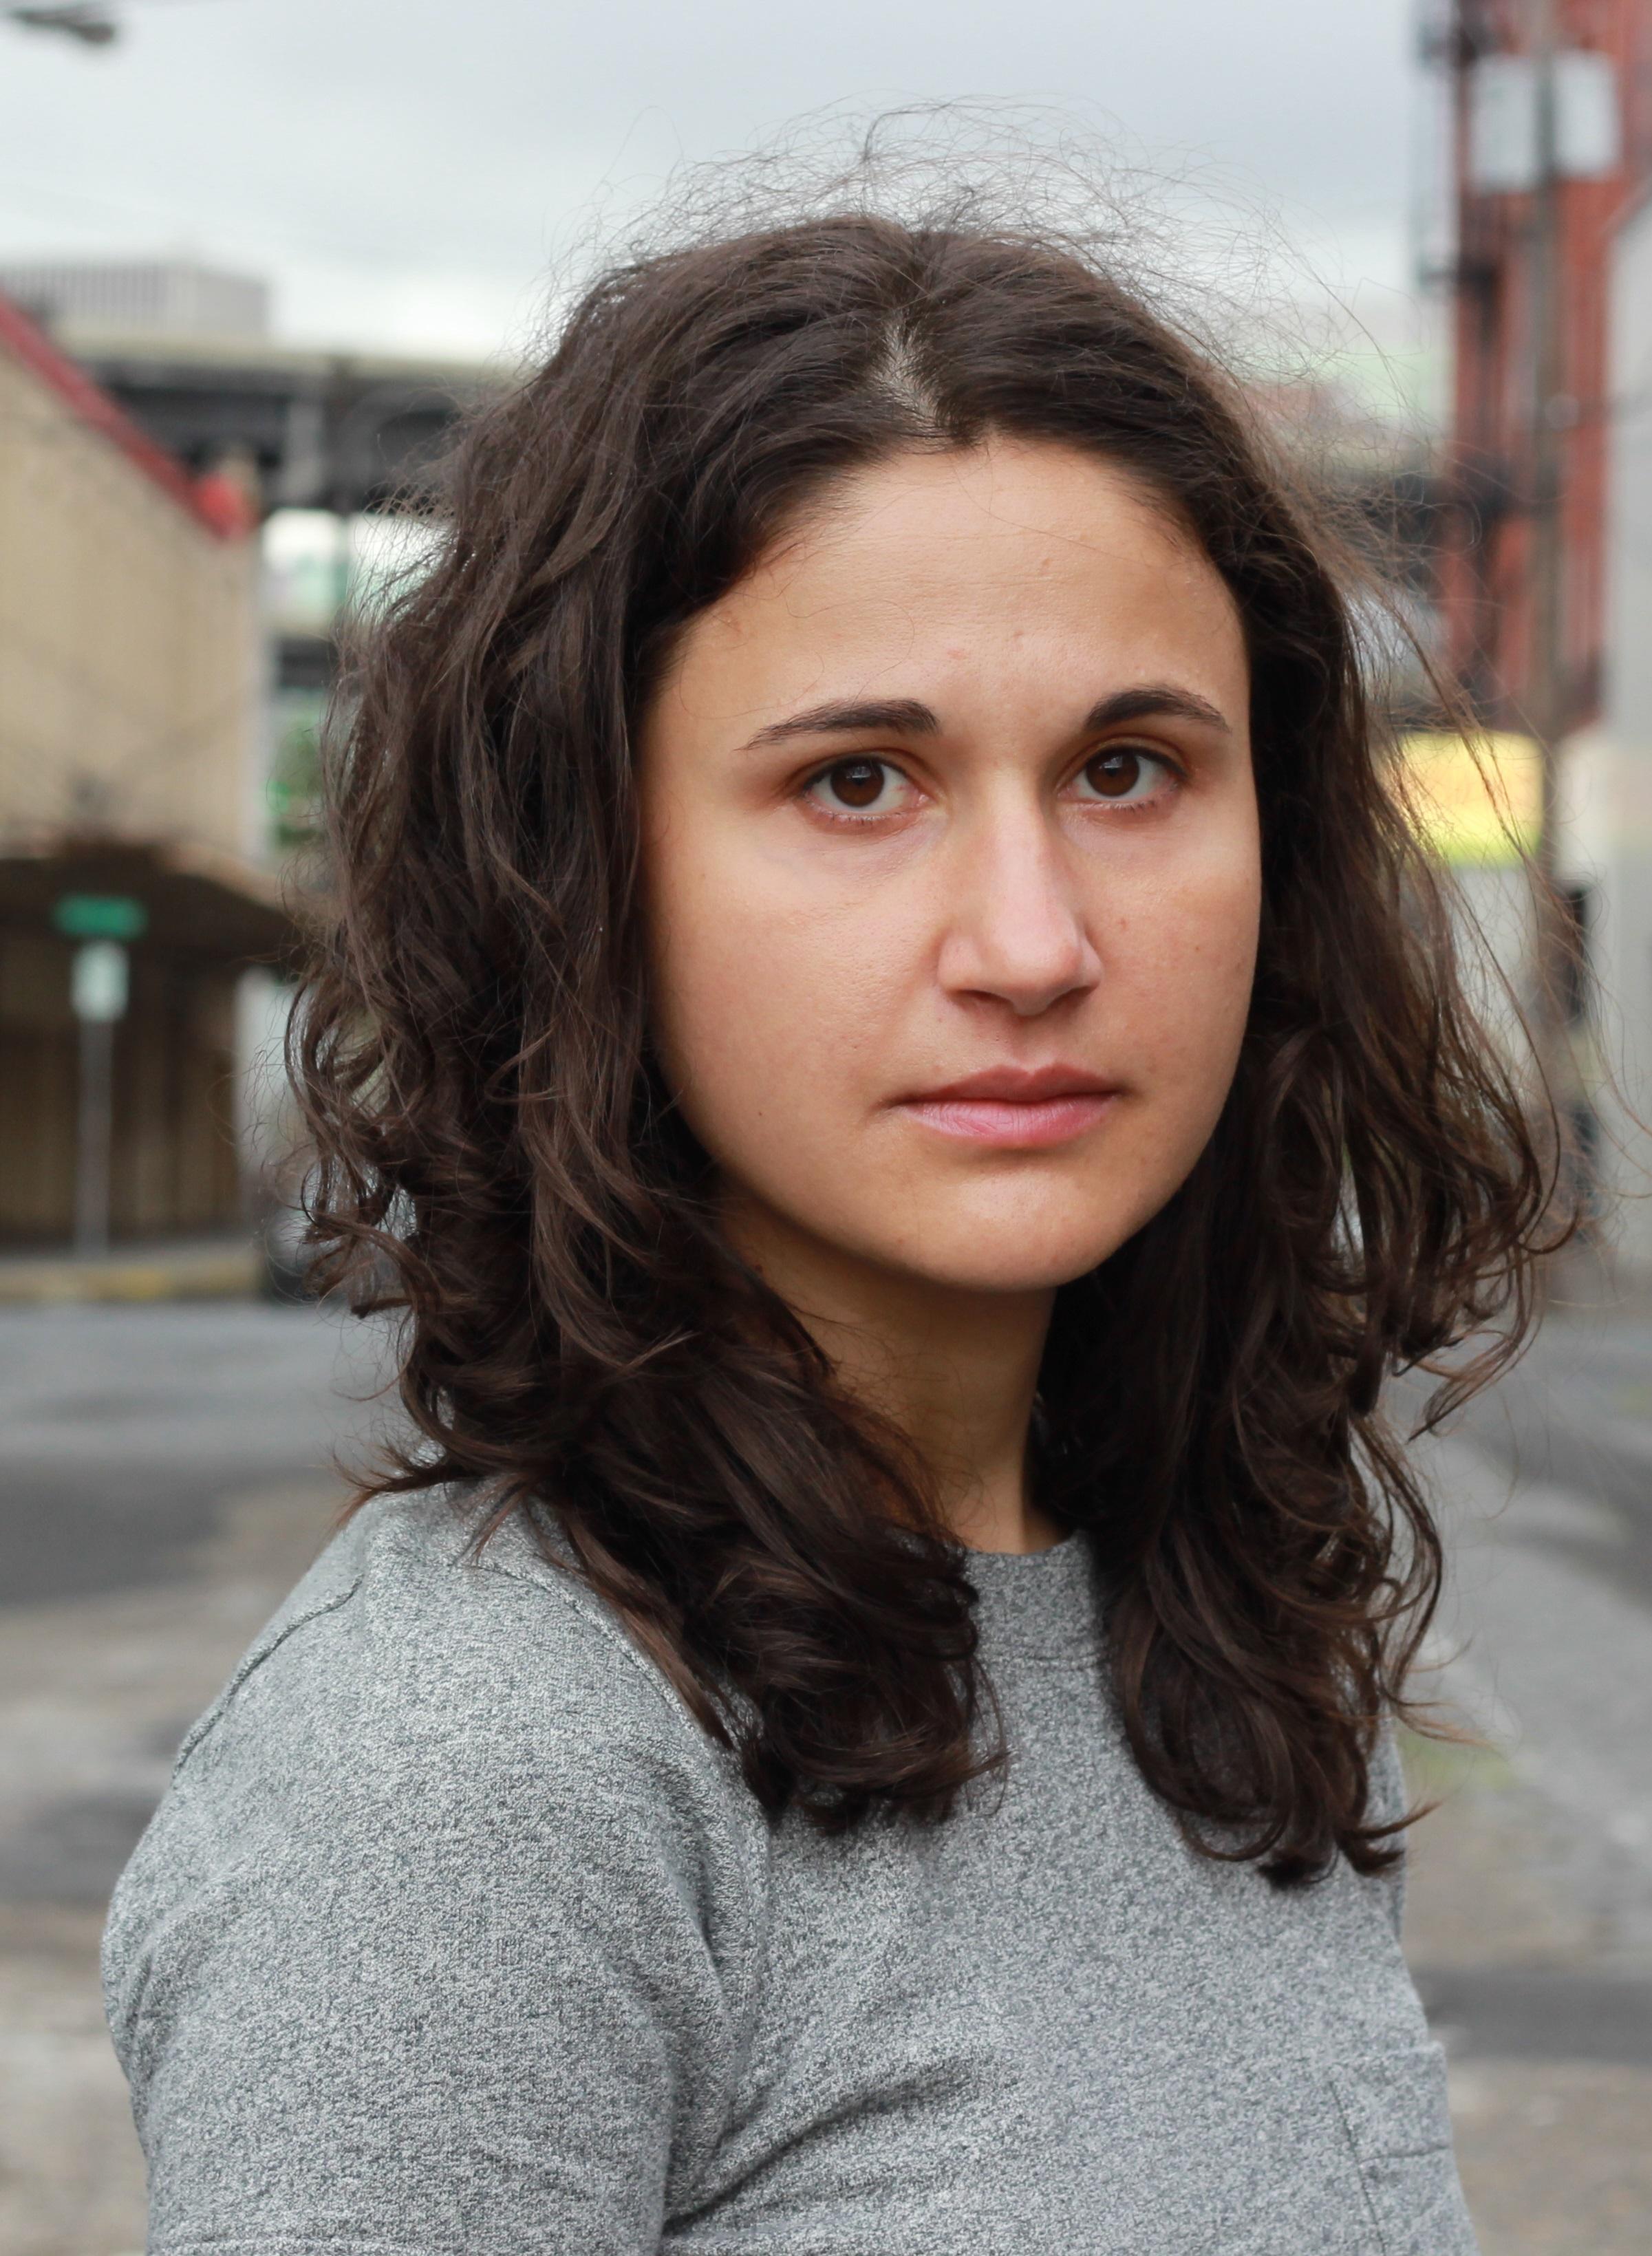 Headshot of Kira Lesley